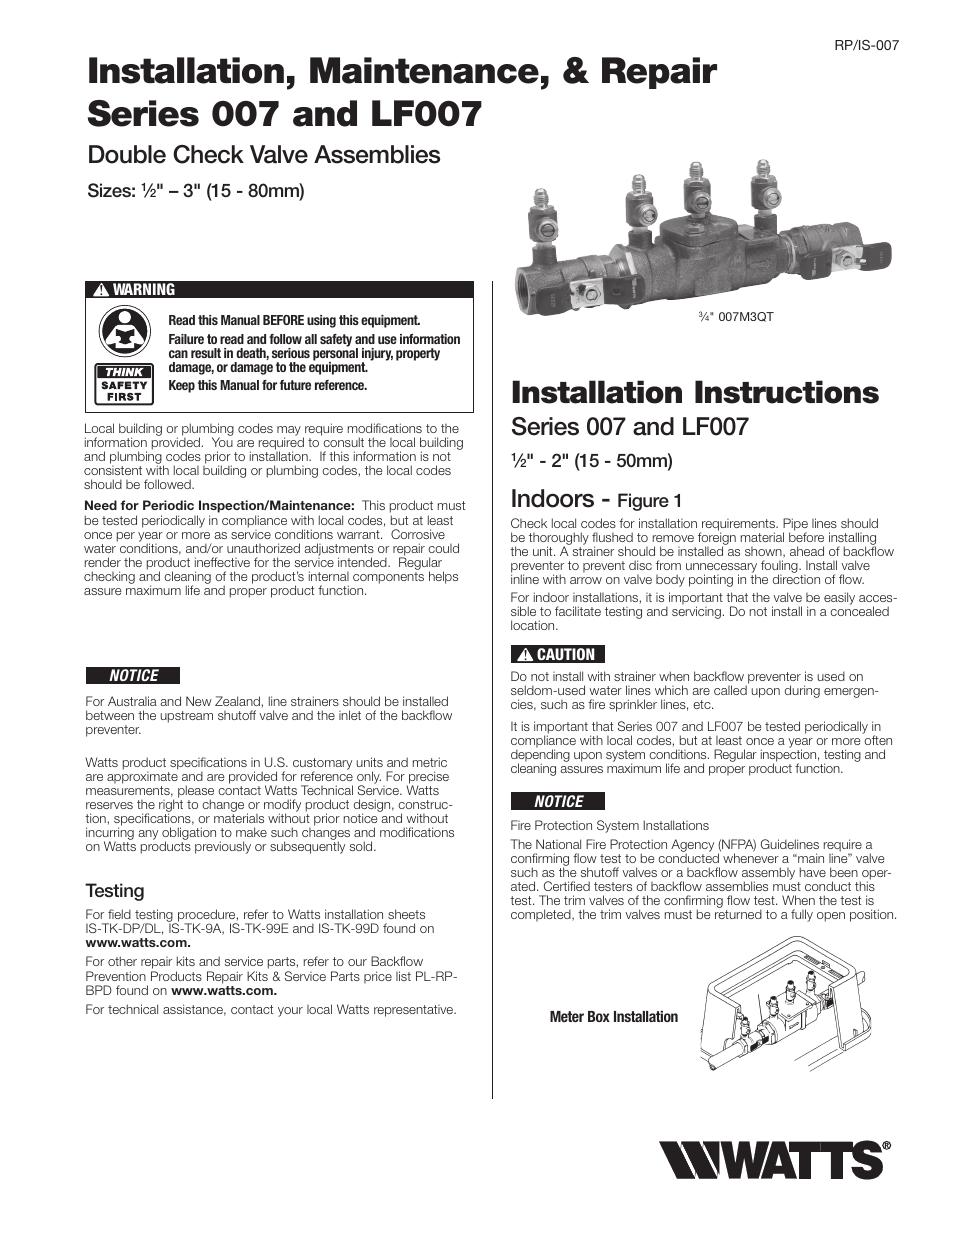 Watts backflow installation instructions